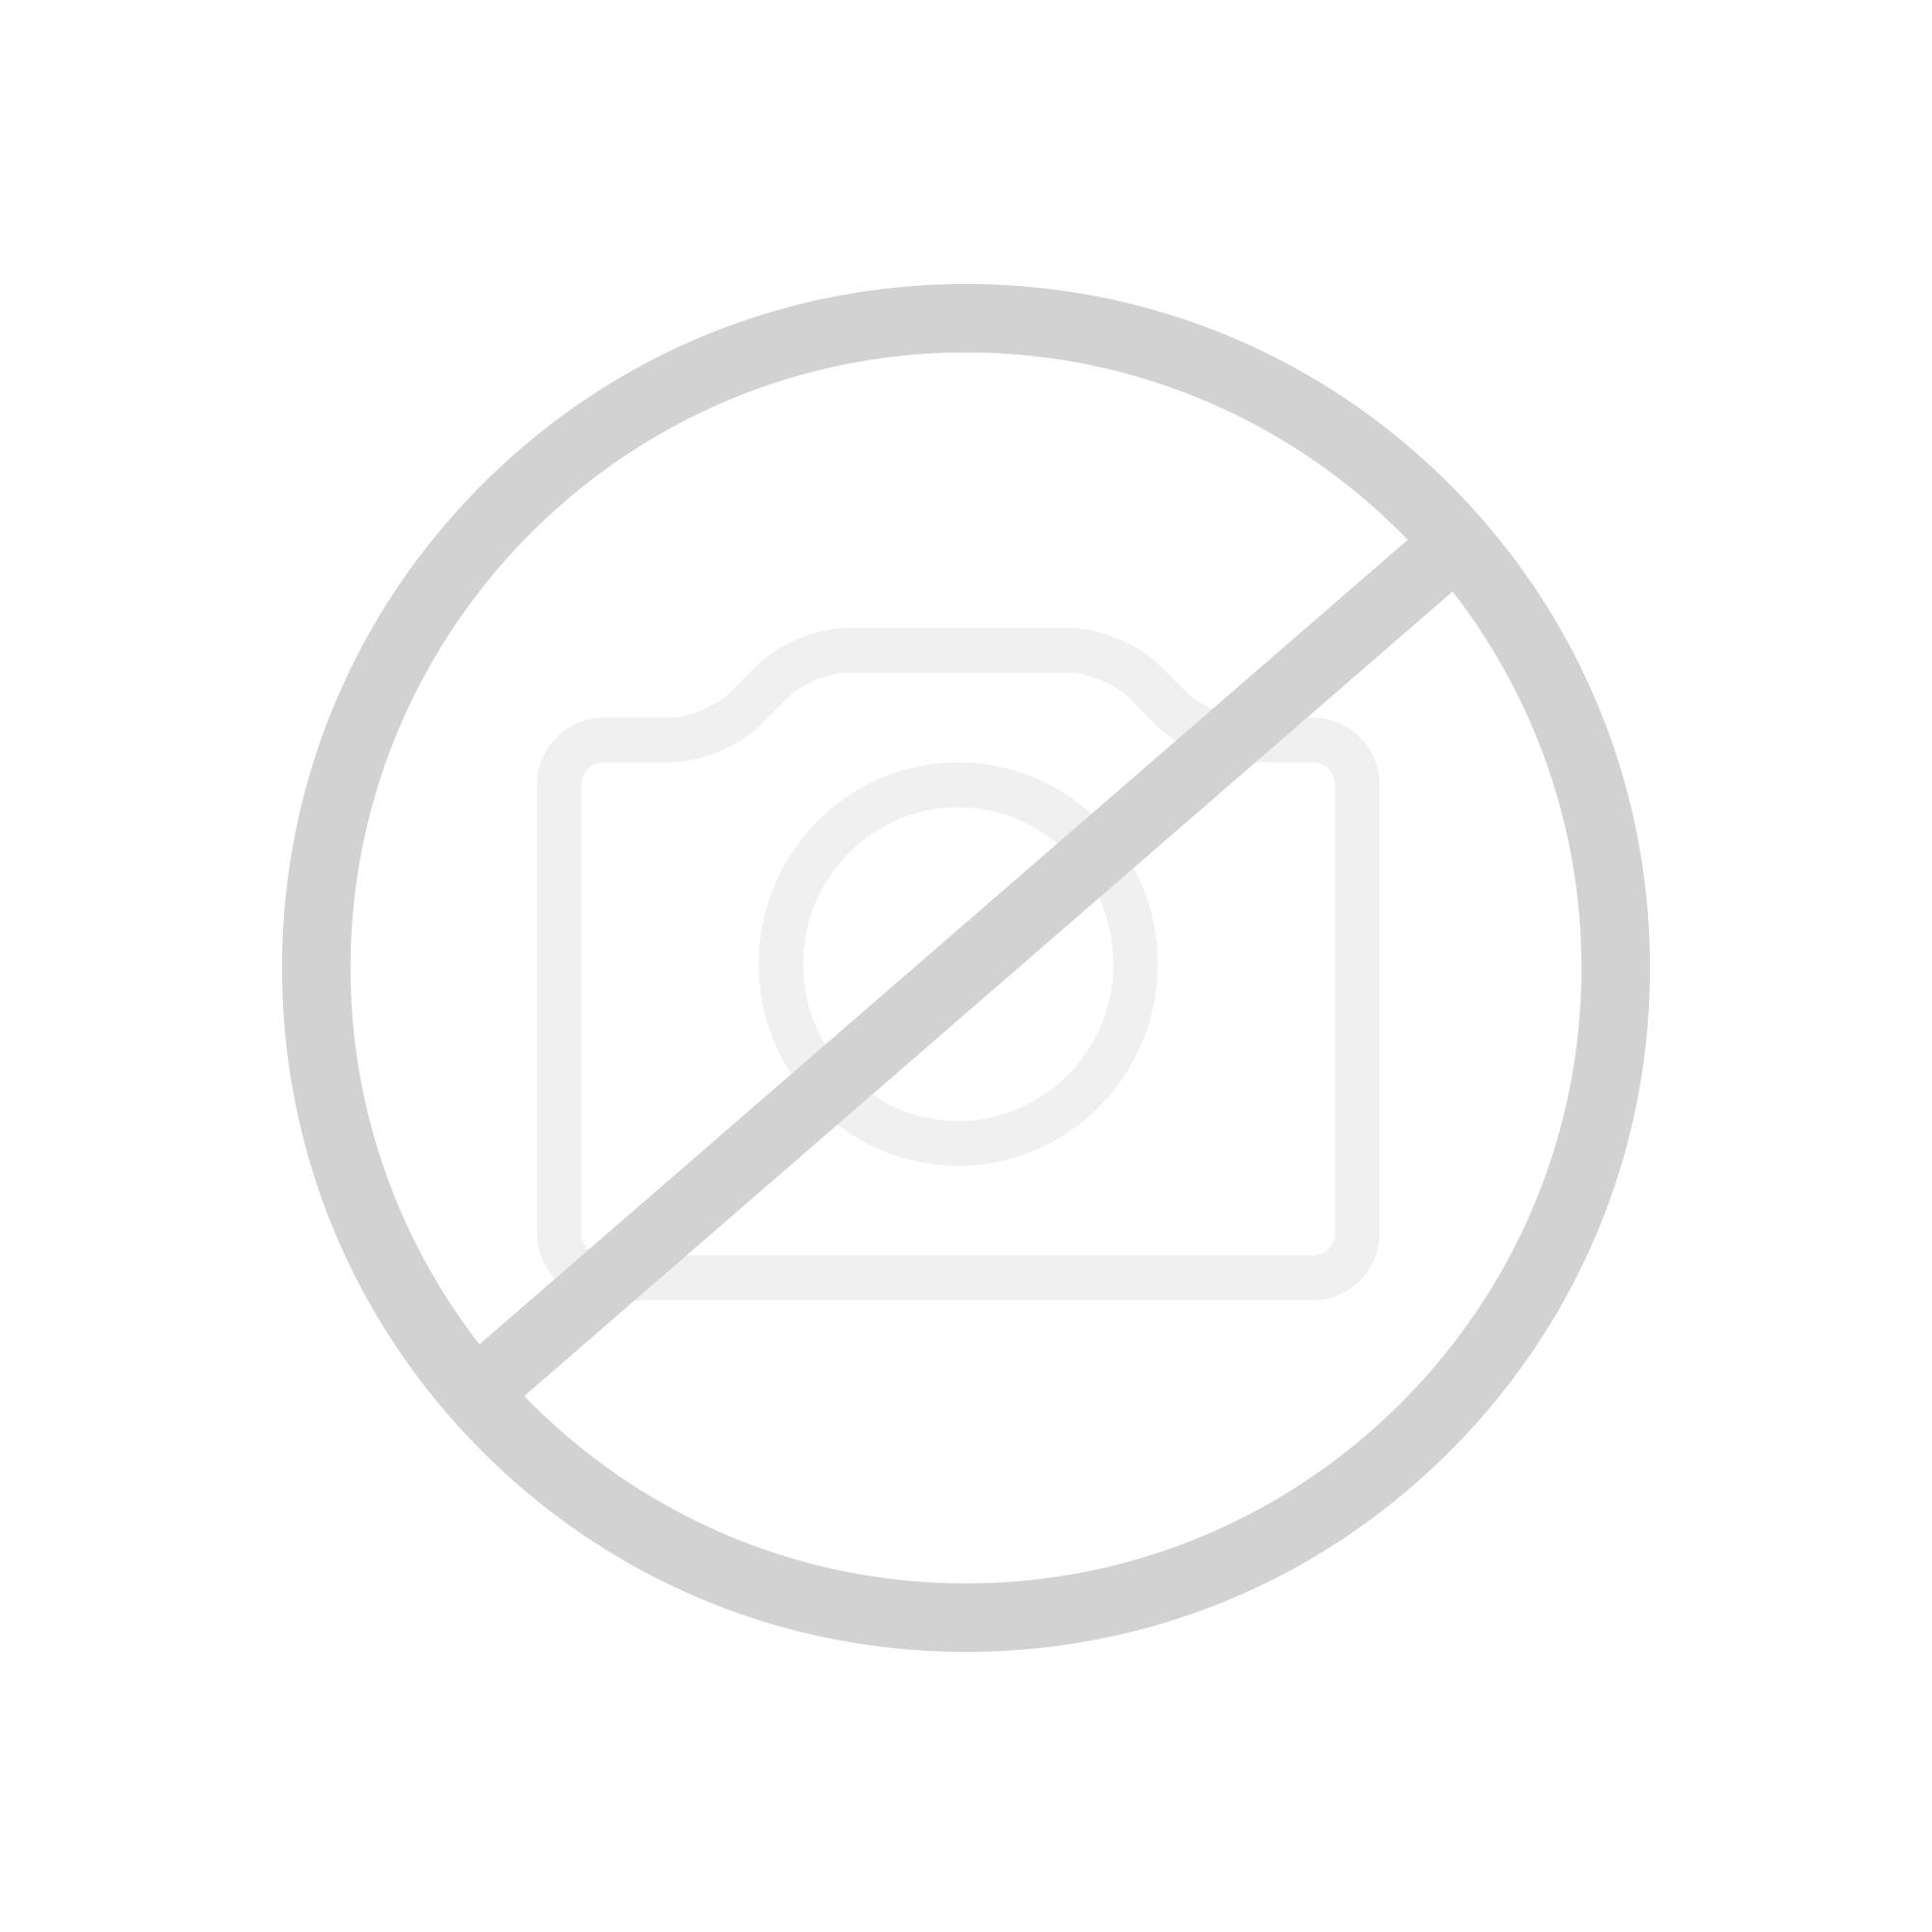 hansgrohe metris einhebel waschtischmischer 260 f r waschsch sseln dn15 31082000 reuter. Black Bedroom Furniture Sets. Home Design Ideas